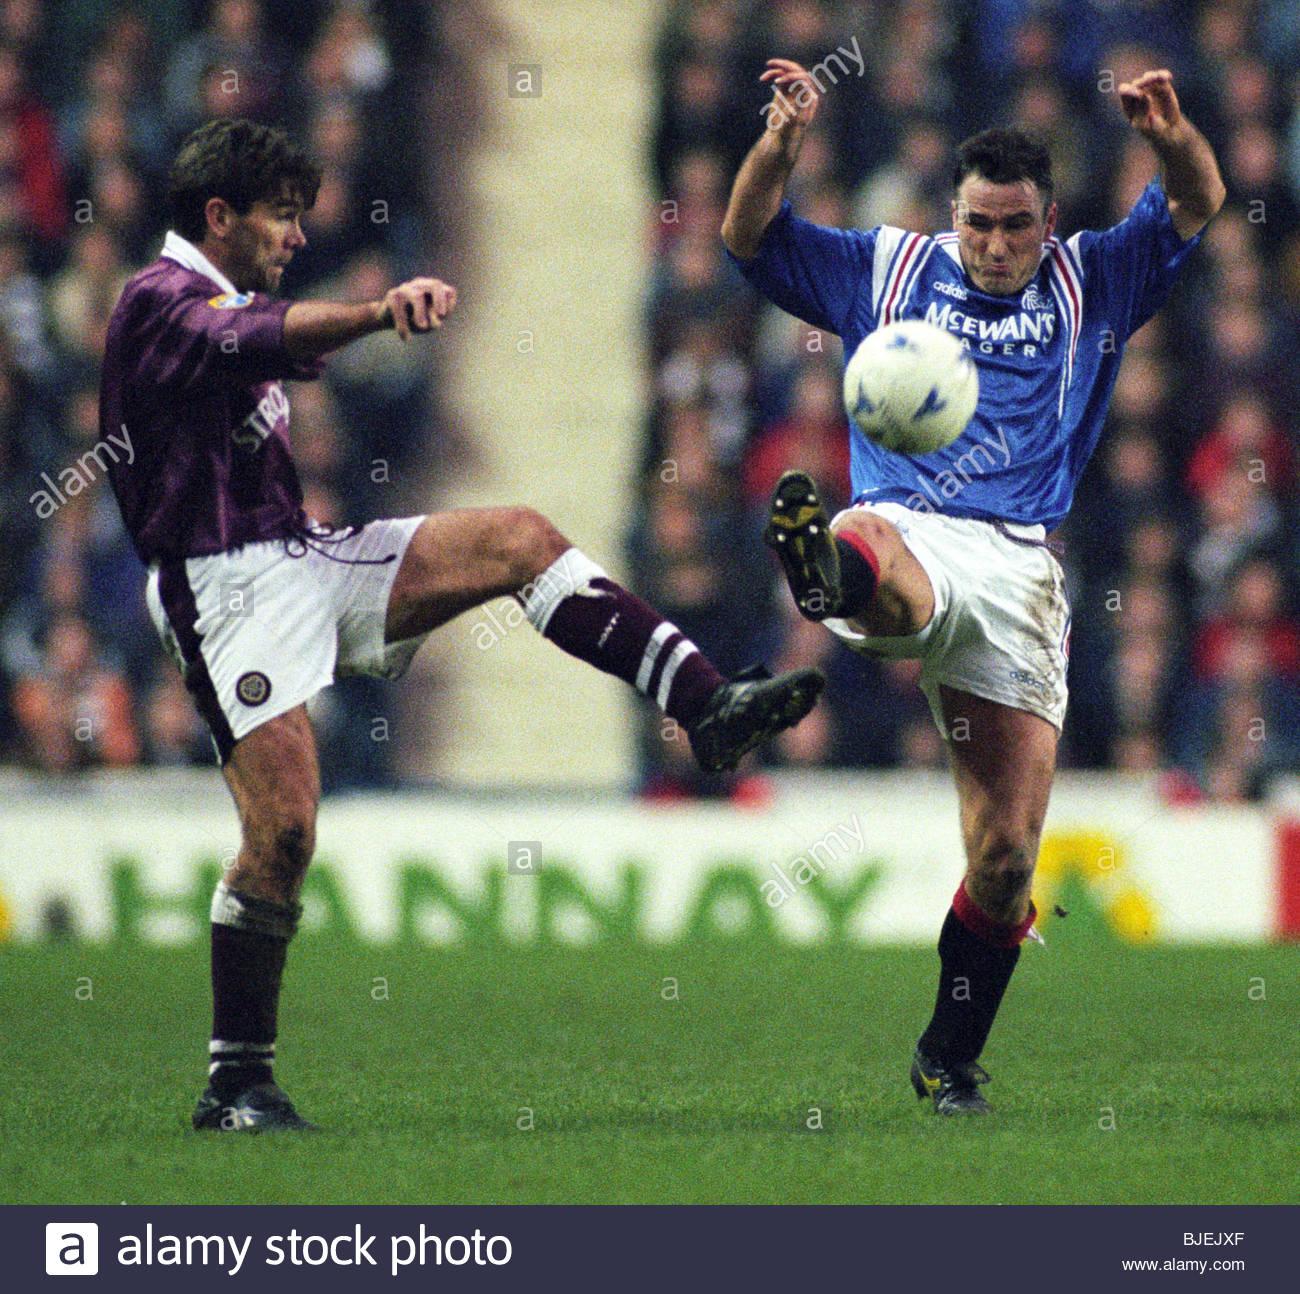 01/02/97 BELL'S PREMIER DIVISION RANGERS V HEARTS (0-0) IBROX - GLASGOW Rangers midfielder Ian Ferguson (right) - Stock Image